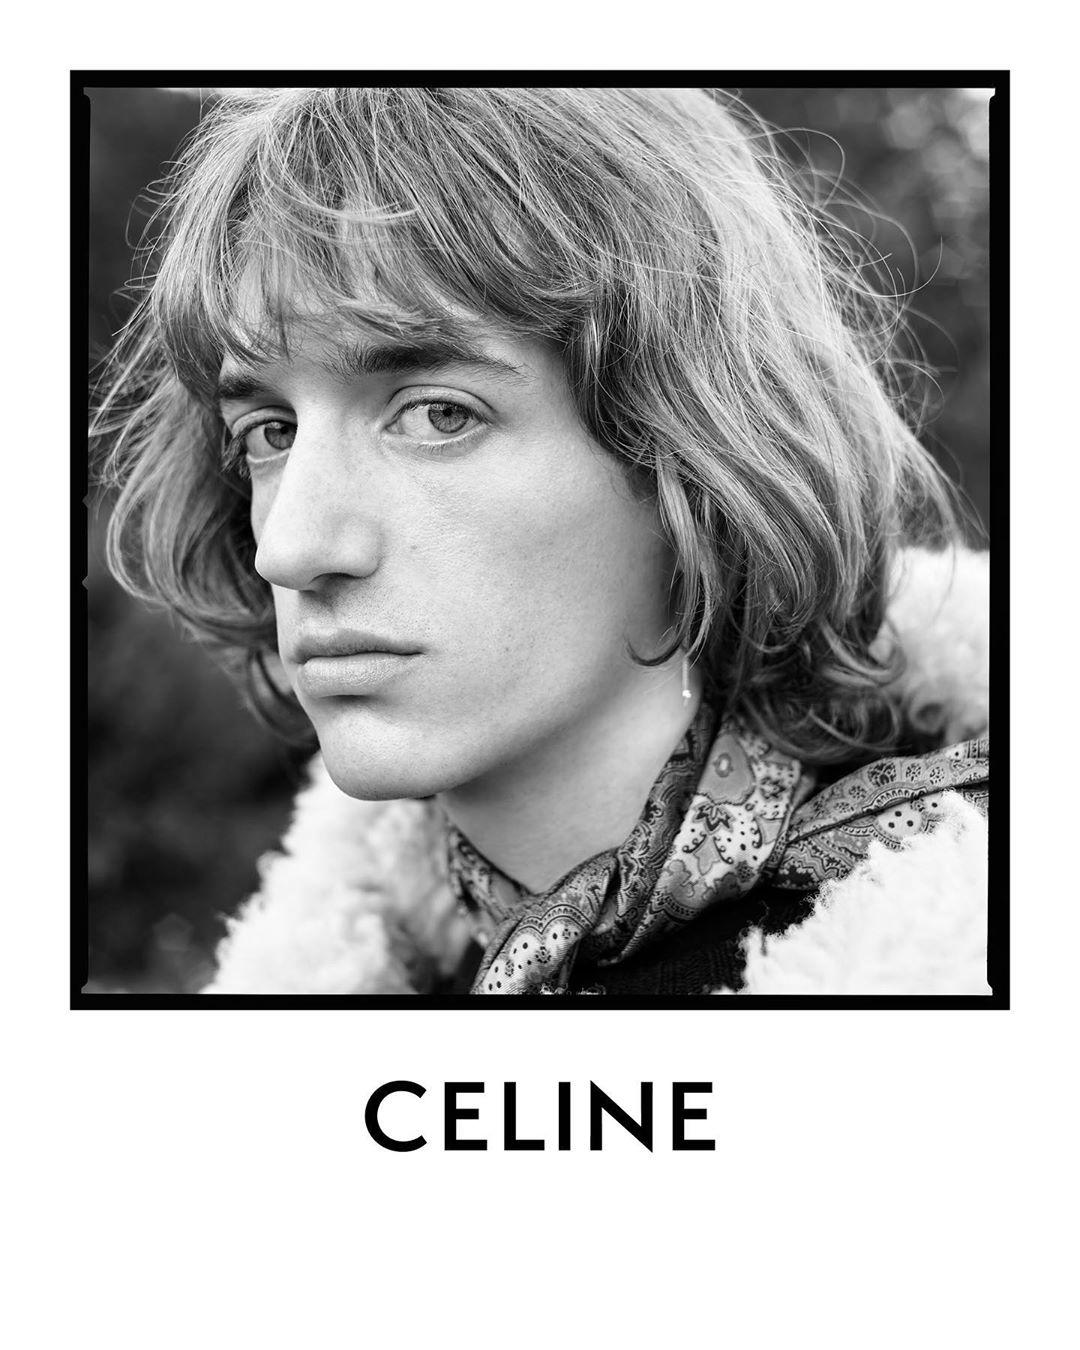 Celine Fall 2020 Fashion Men's Ad Campaign by Hedi Slimane Photos